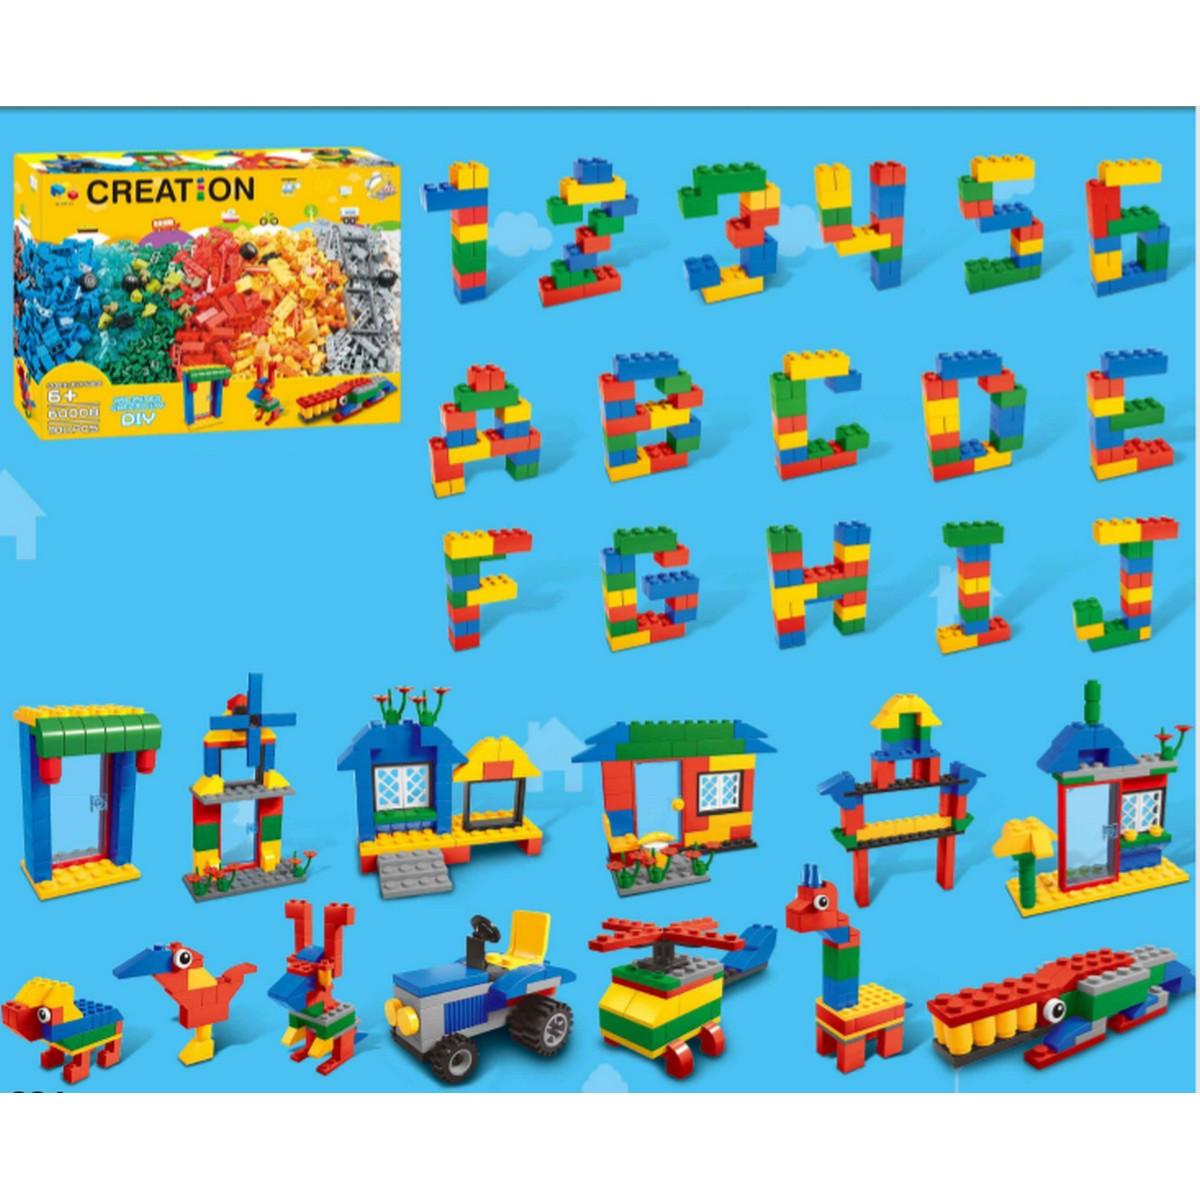 550 pieces ABS plastic toy brick DIY block legoing building block set